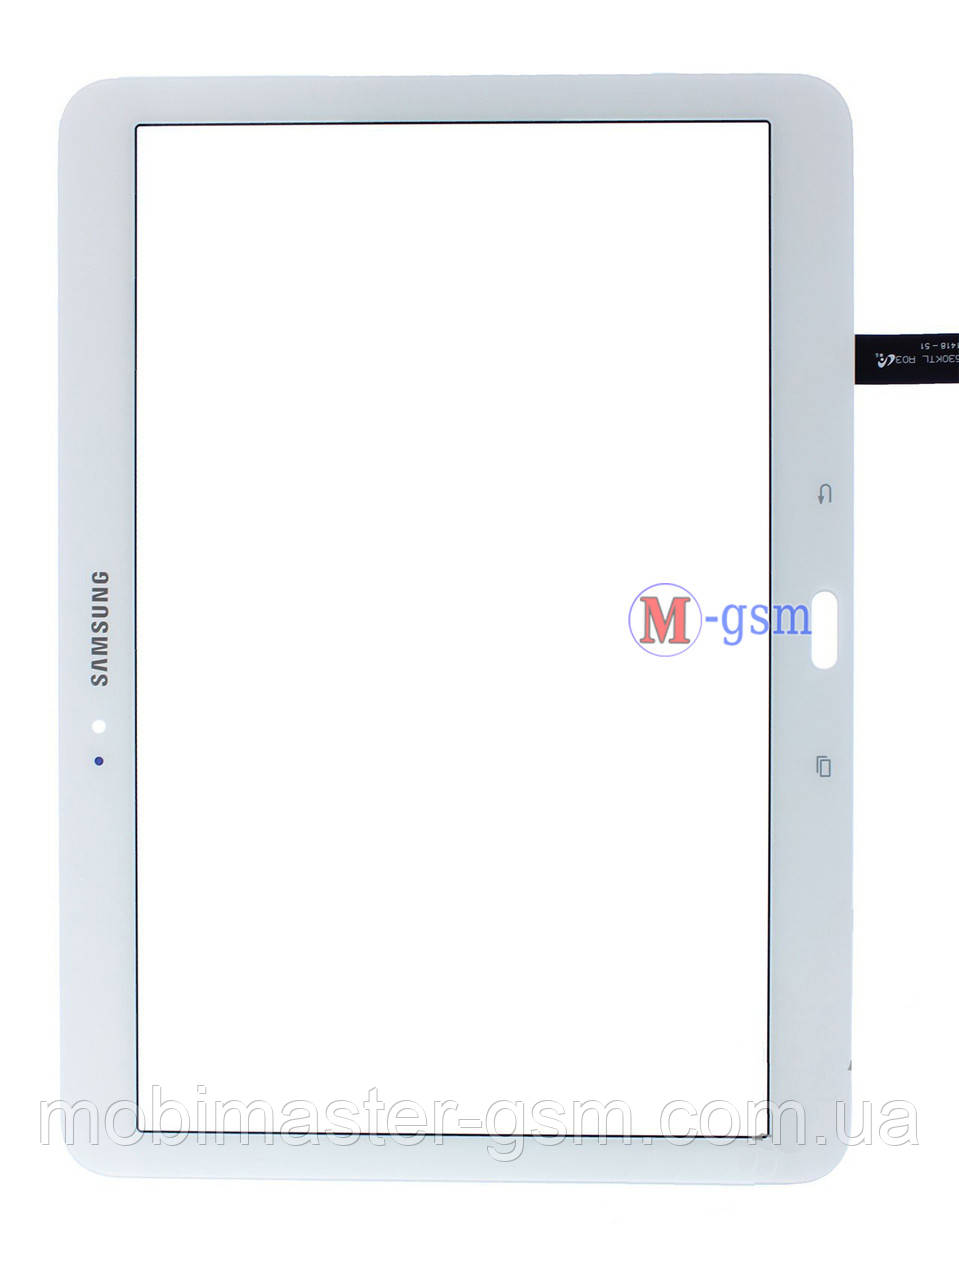 Тачскрин (сенсор) Samsung T530, T531, T535 белый